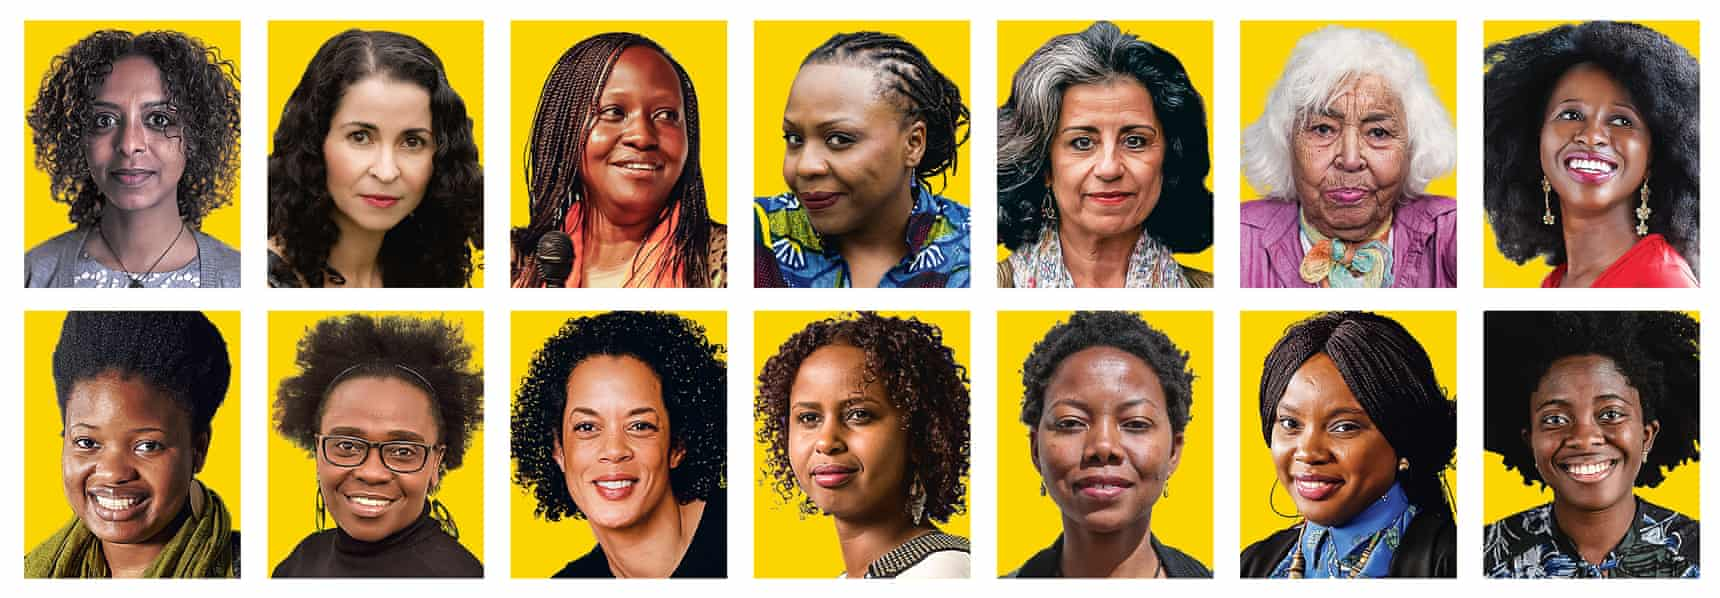 Top row (from left): Maaza Mengiste, Laila Lalami, Doreen Baingana, Lola Shoneyin, Ahdaf Soueif, Nawal El Saadawi and Imbolo Mbue. Bottom row: Chibundu Onuzo, Jennifer Nansubuga Makumbi, Aminatta Forna, Nadifa Mohamed, NoViolet Bulawayo, Ayobami Adebayo and Yaa Gyasi. Illustration: Guardian Design